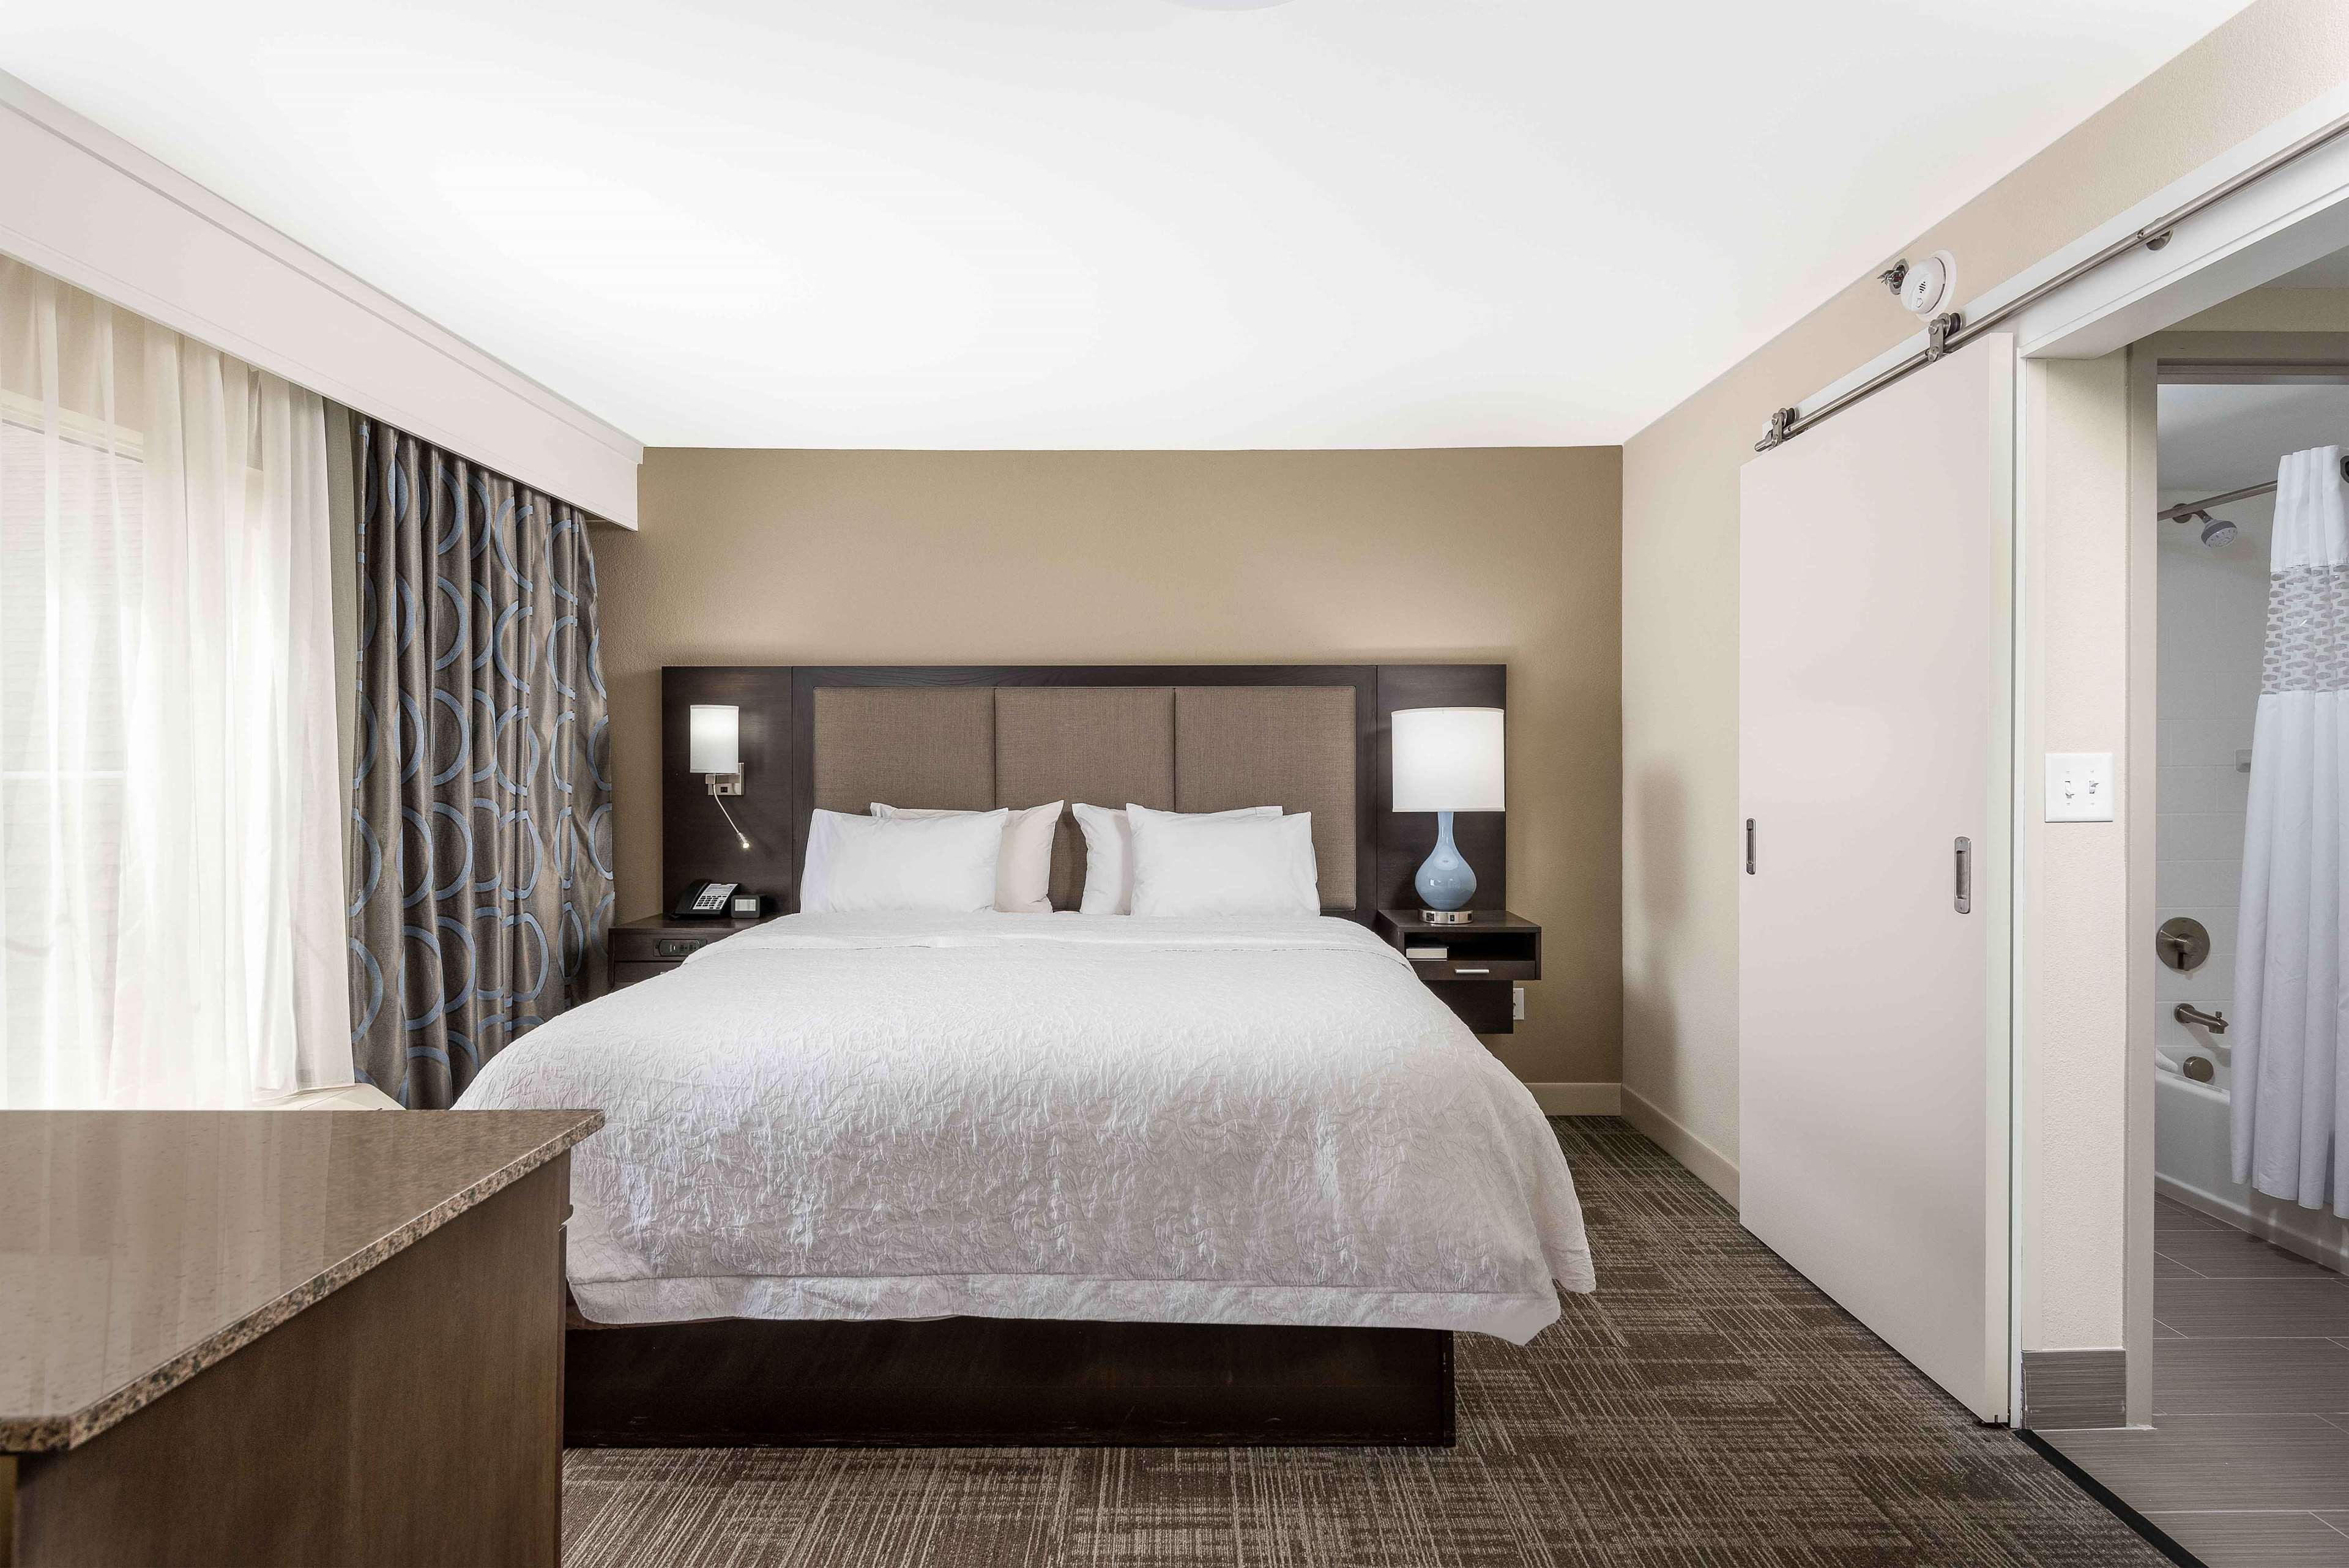 Hampton Inn & Suites Chapel Hill/Durham, Area image 18